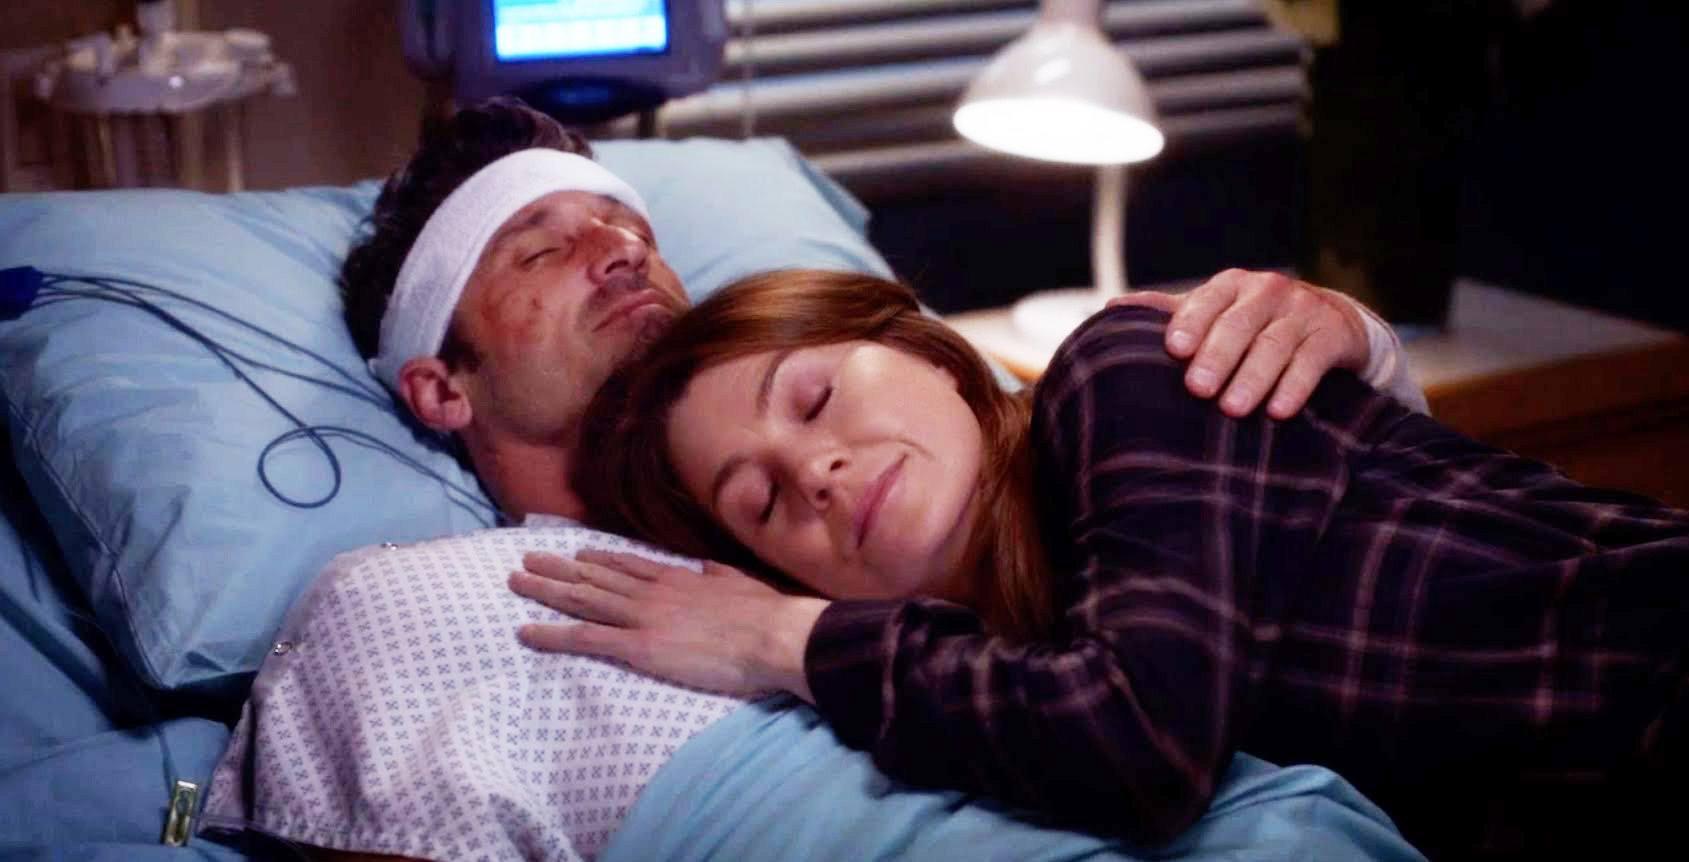 Derek holding Meredith on his death bed in Grey's Anatomy